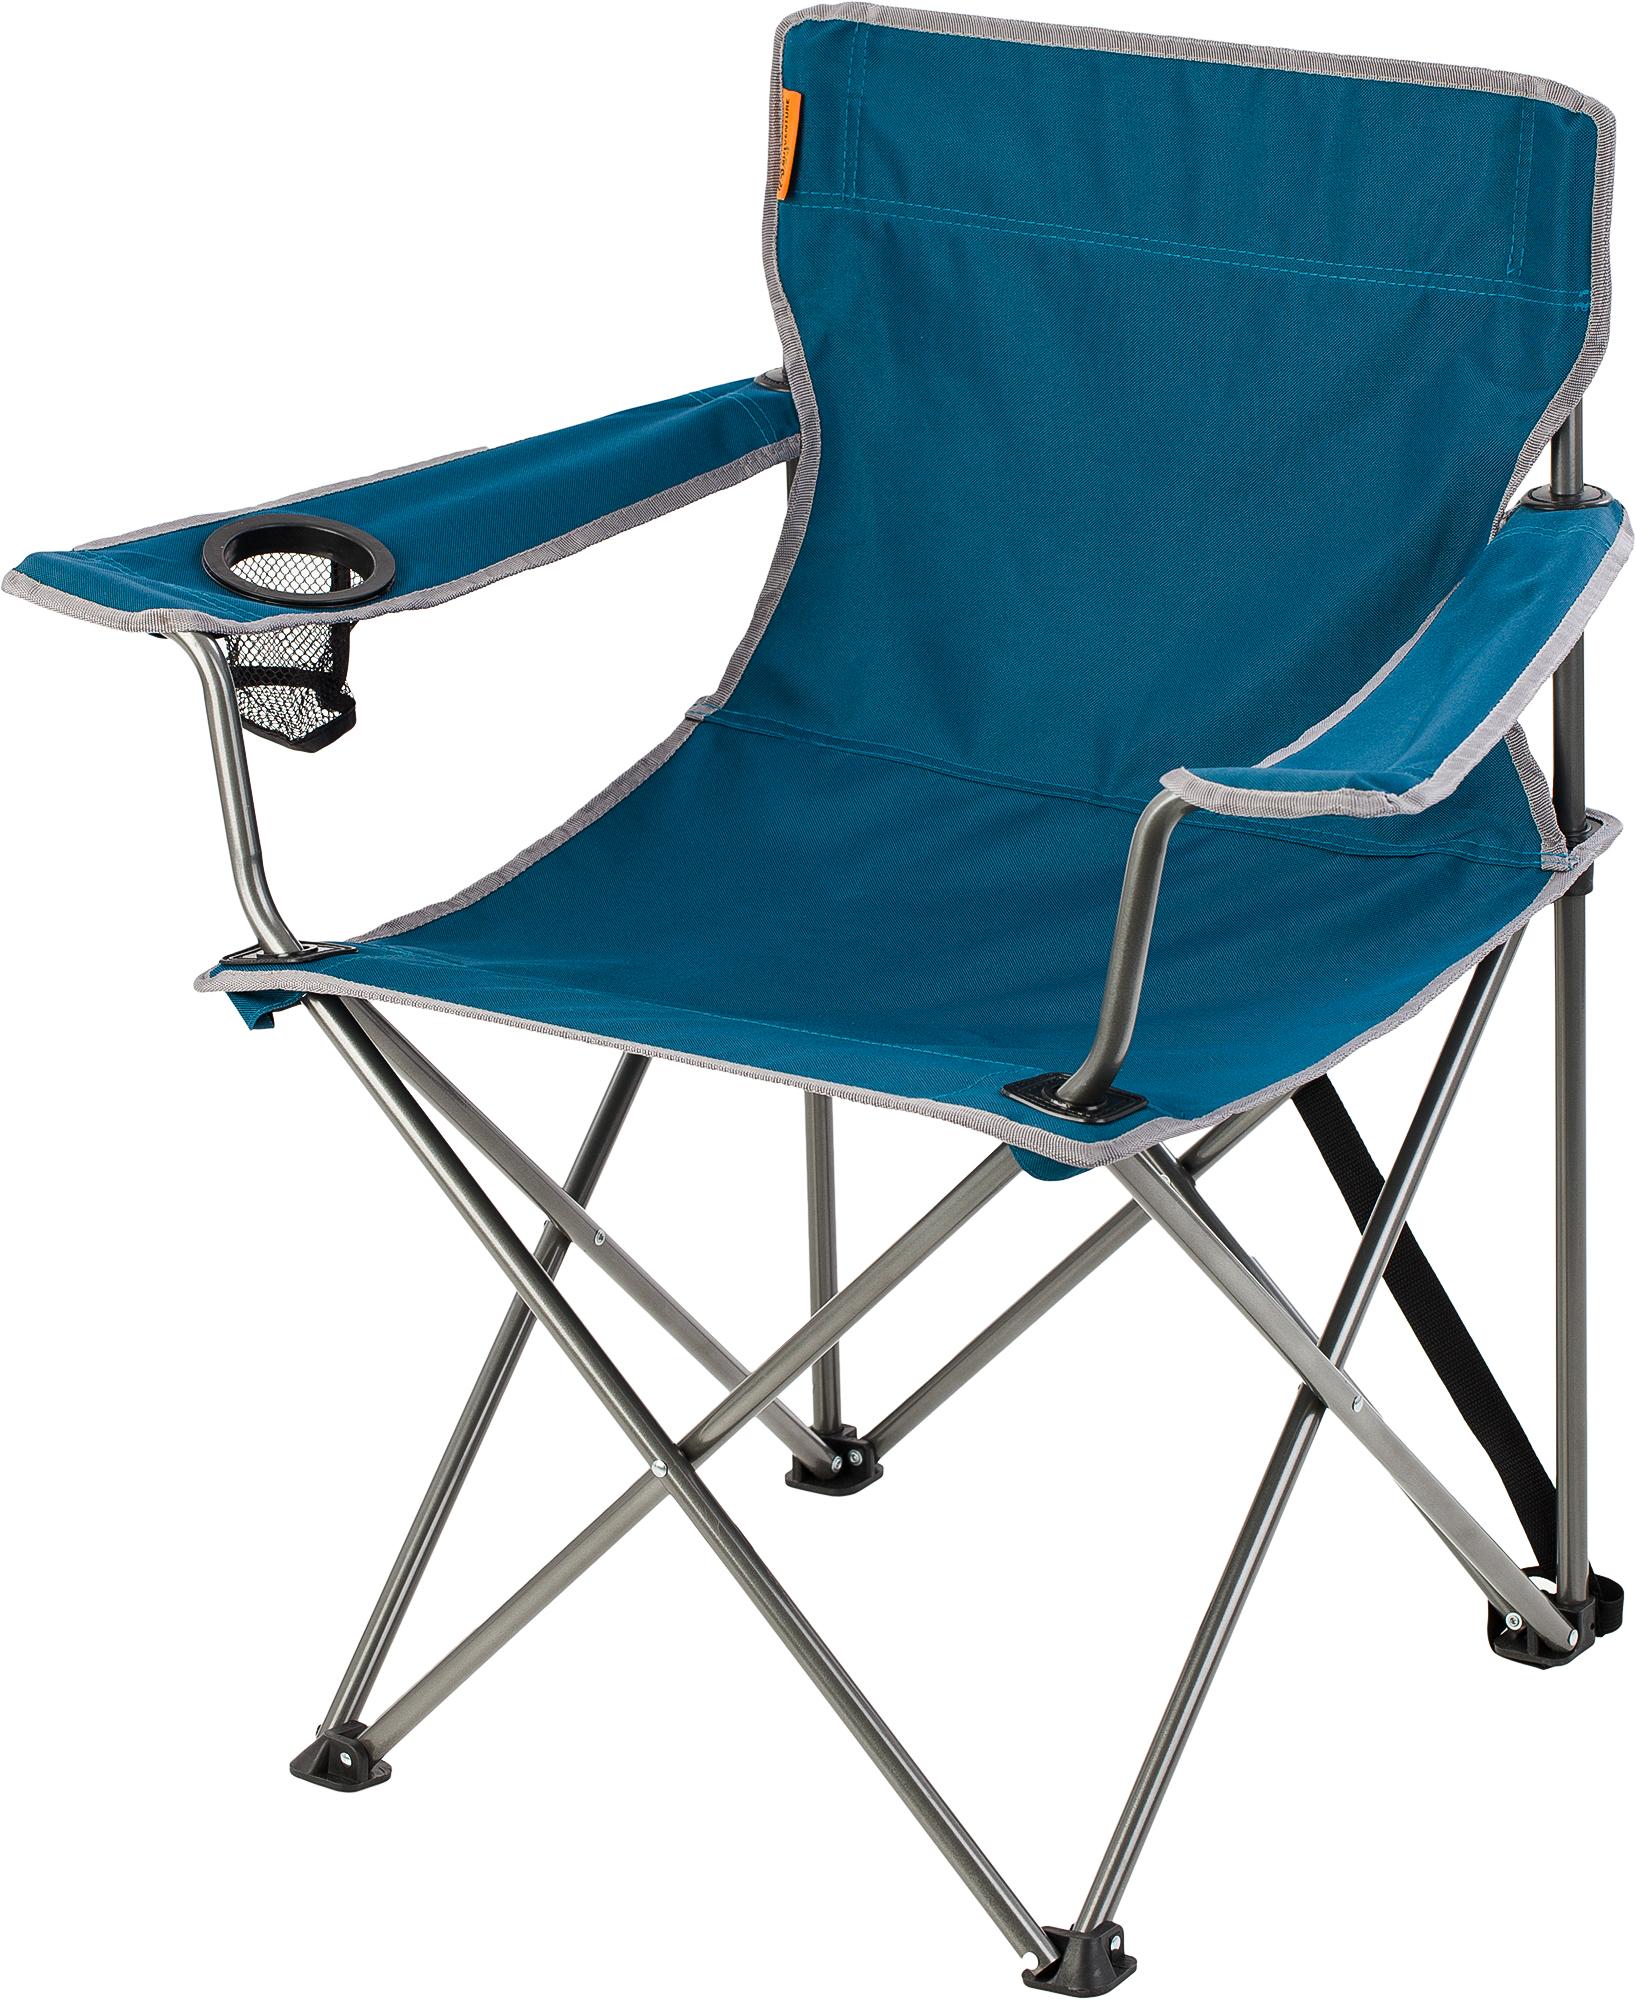 Outventure Кресло кемпинговое Outventure кресло woodland ck 009 deluxe складное кемпинговое 63 x 63 x 110 см сталь